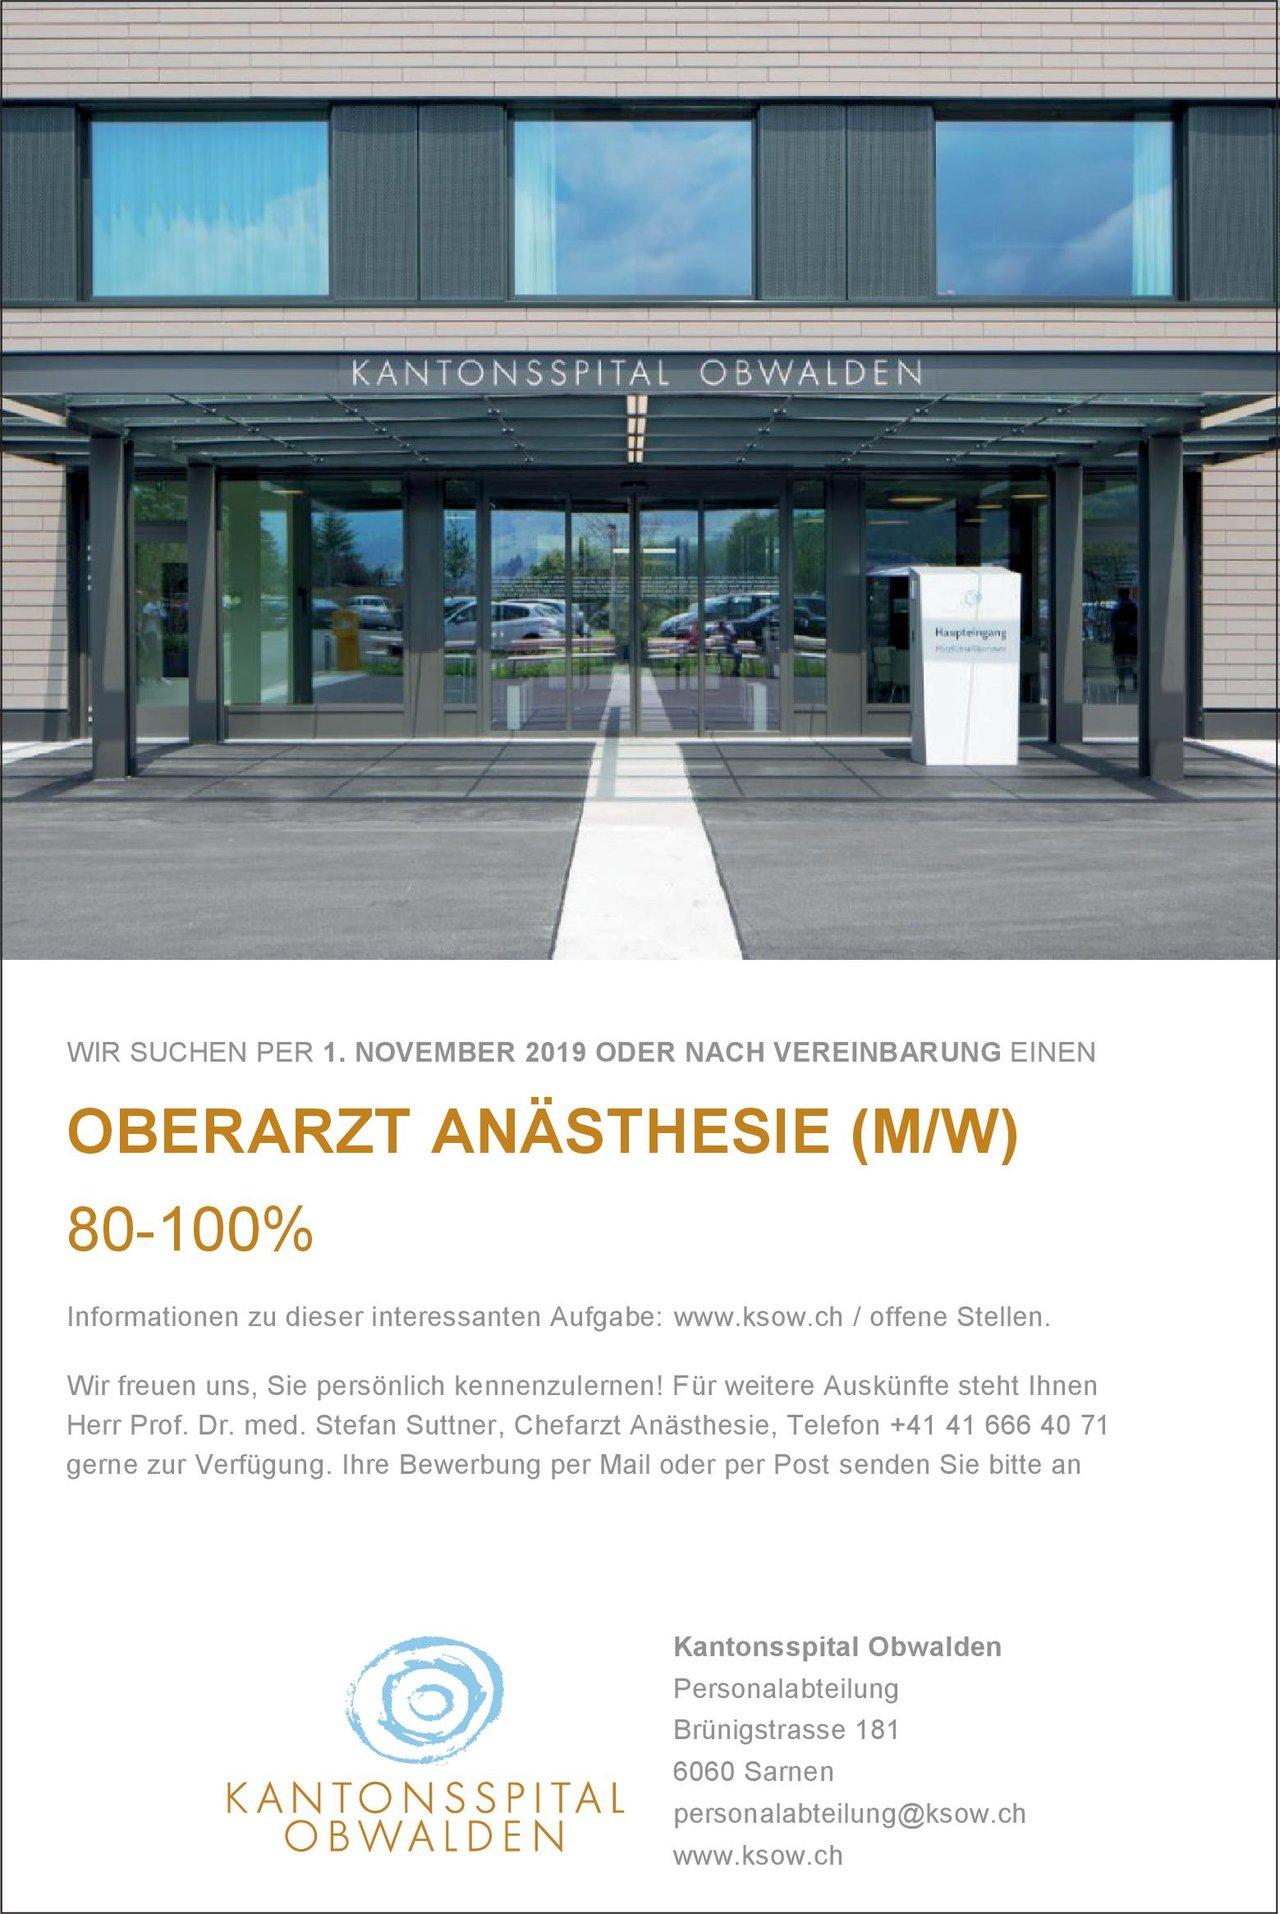 Kantonsspital Obwalden Oberarzt Anästhesie (m/w) 80-100 % Anästhesiologie / Intensivmedizin Oberarzt